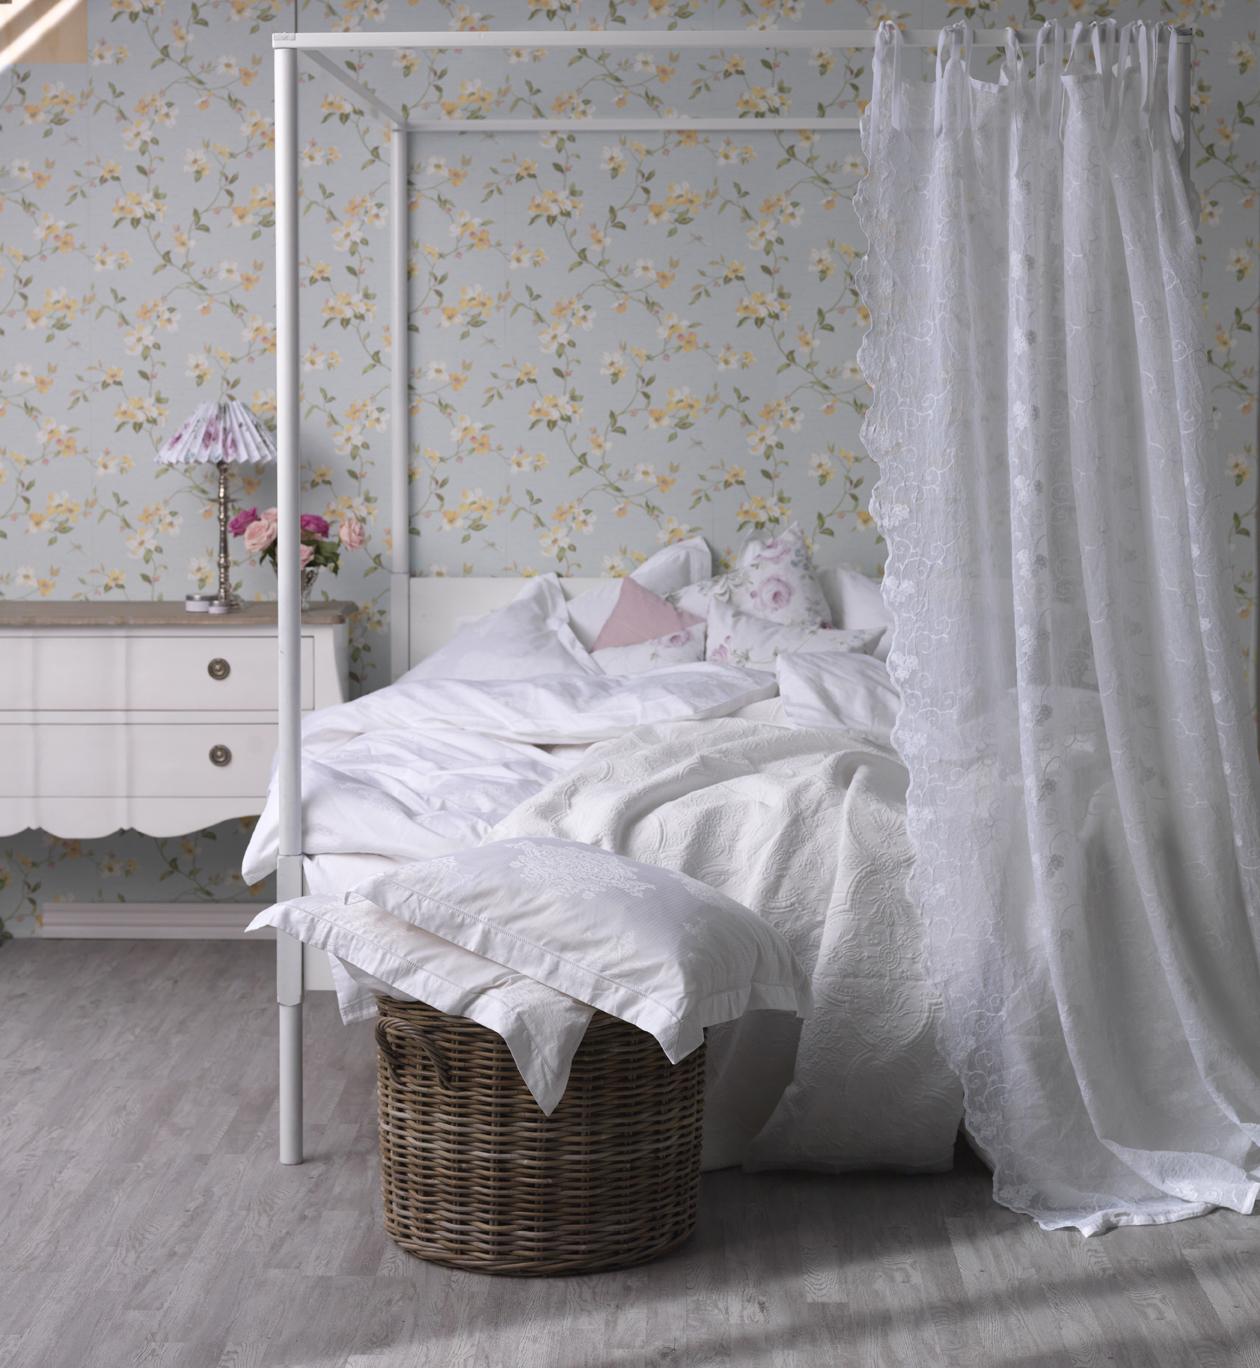 Cum poti avea un dormitor romantic